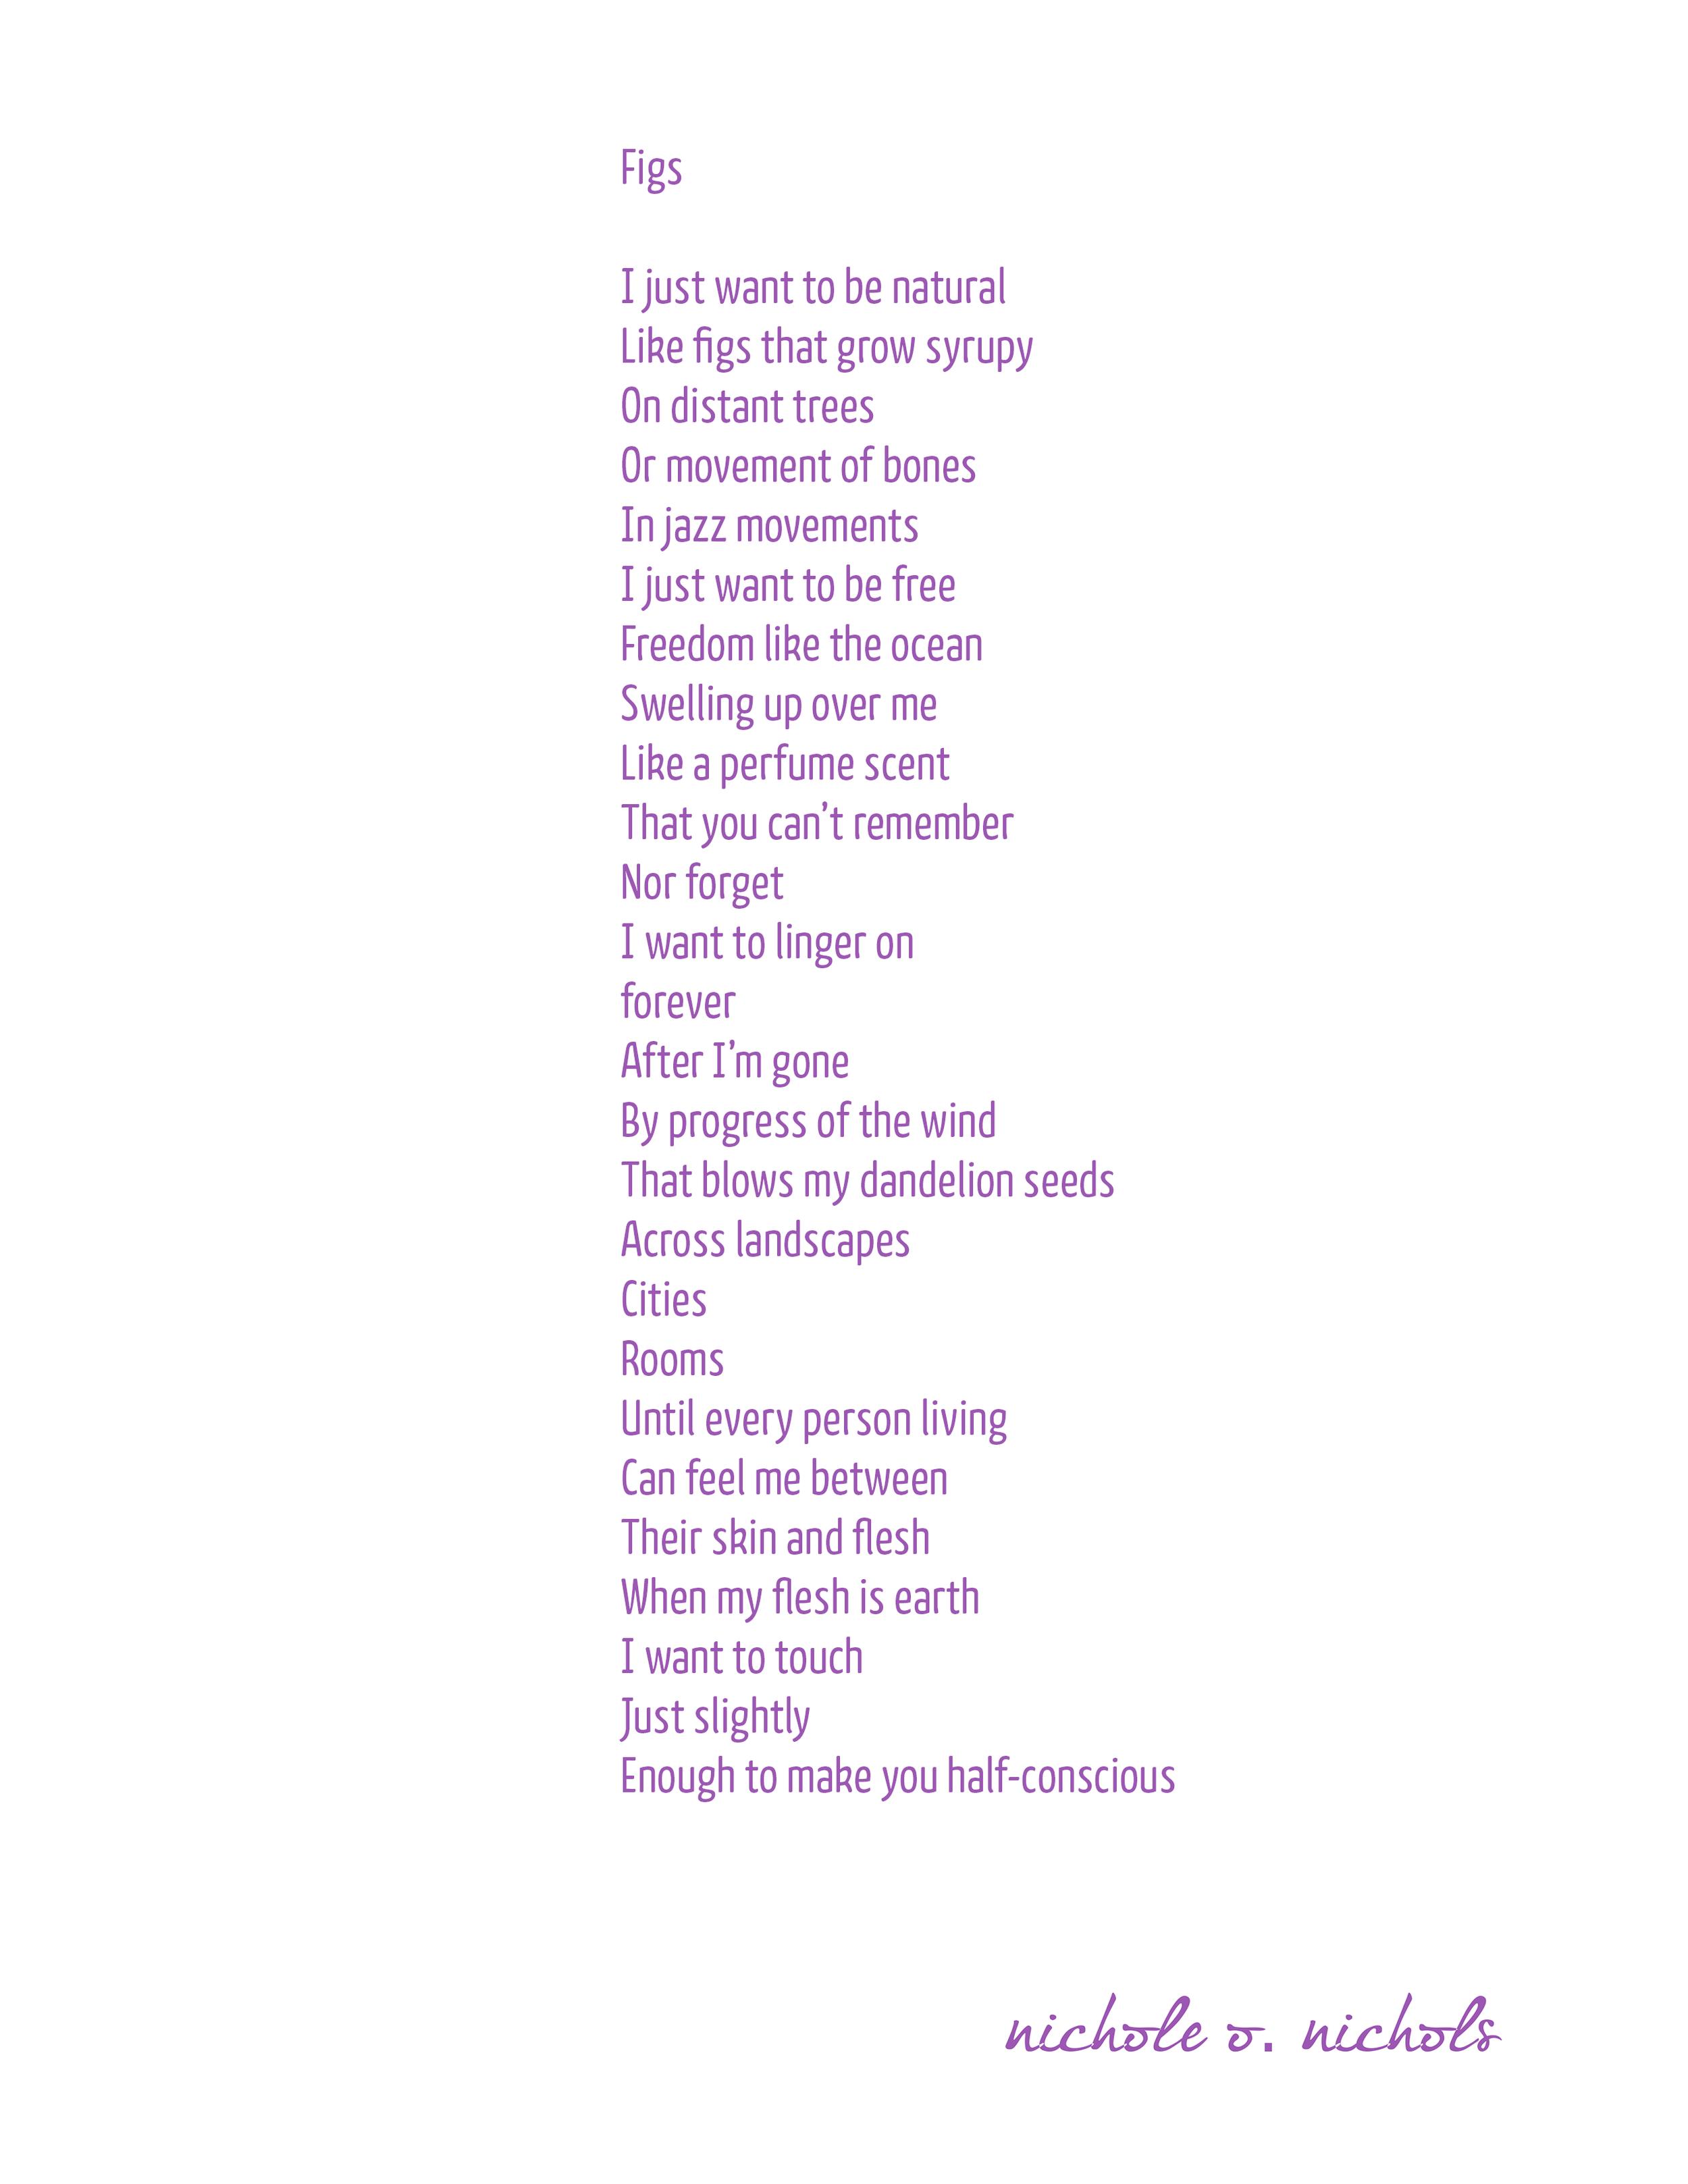 Poem_Figs